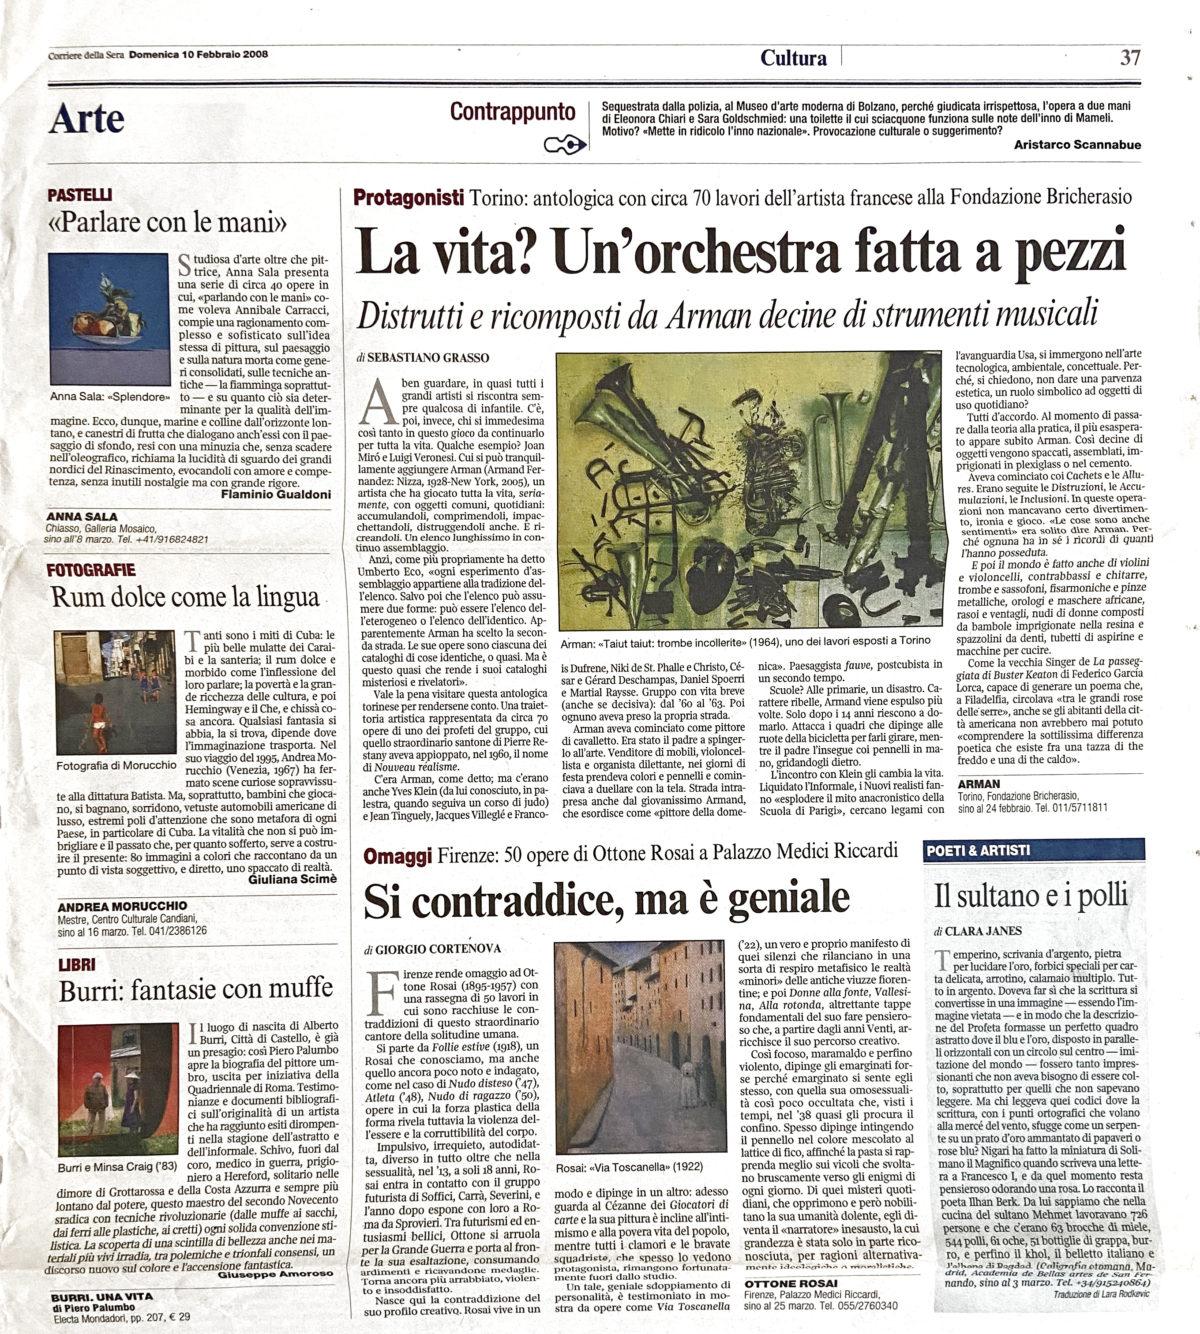 Corsera | 10.02.2008